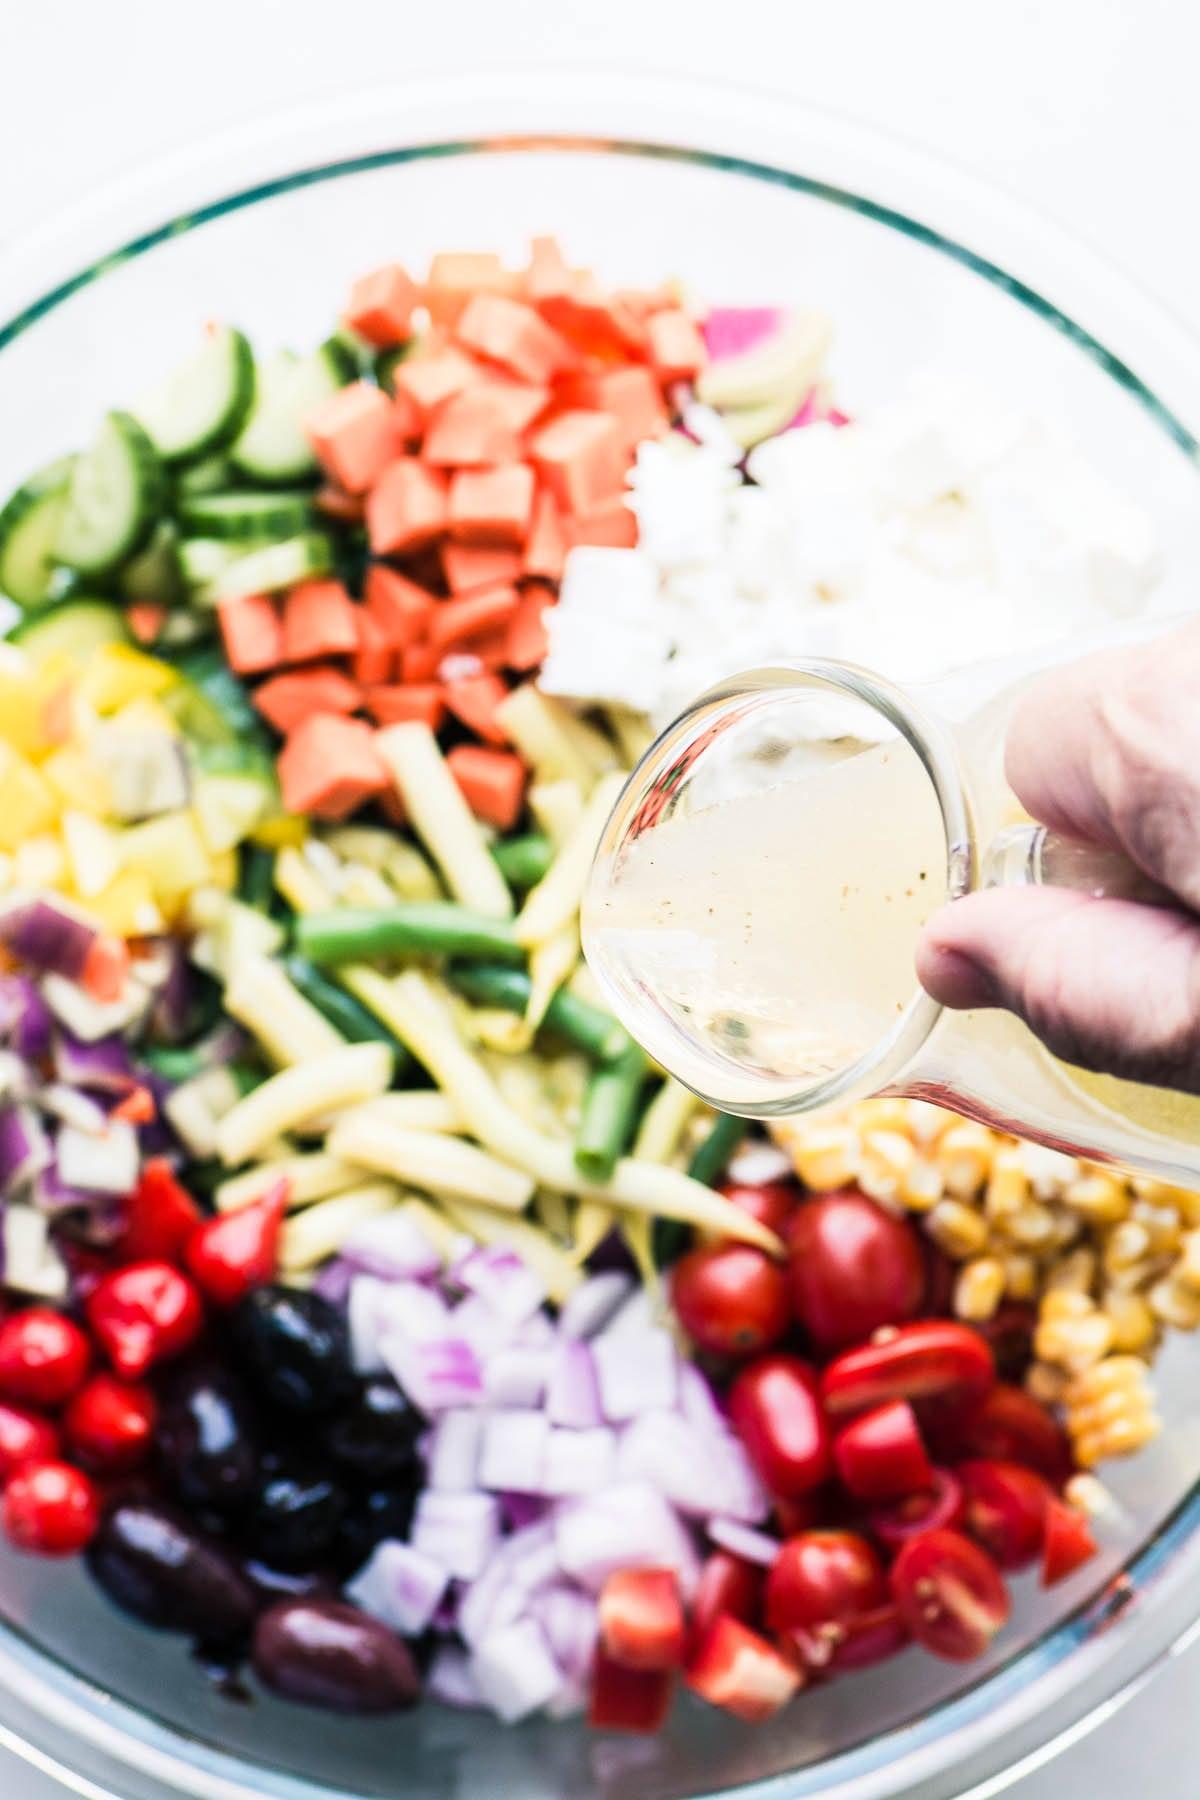 Pouring a tarragon/anchovy/lemon vinaigrette onto a farmers market vegetable salad